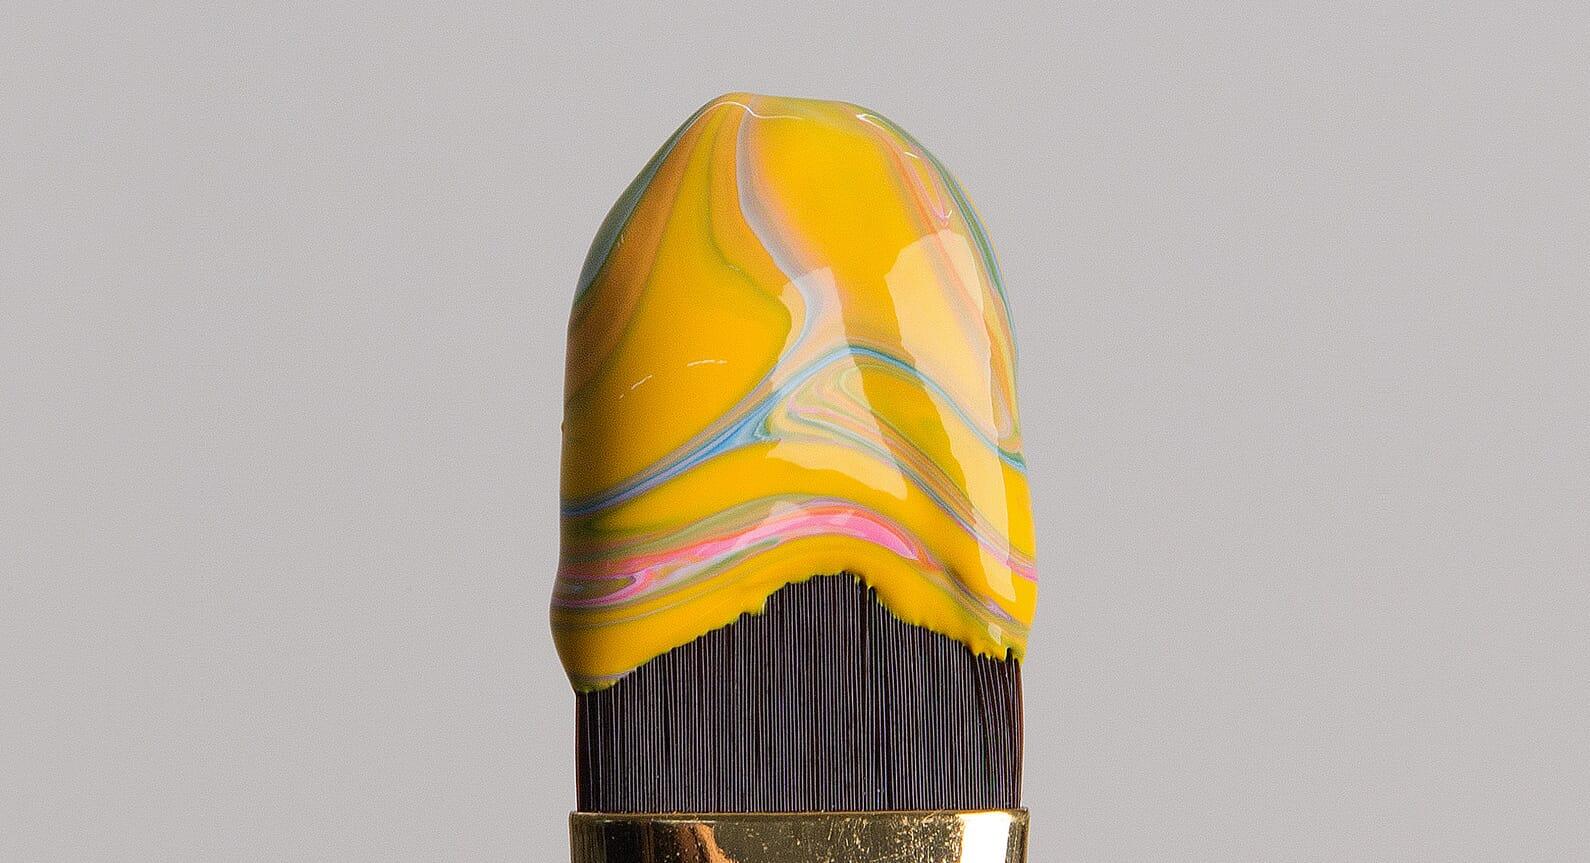 Good Enough To Eat: Ice Cream Paint Brushes By José Lourenço